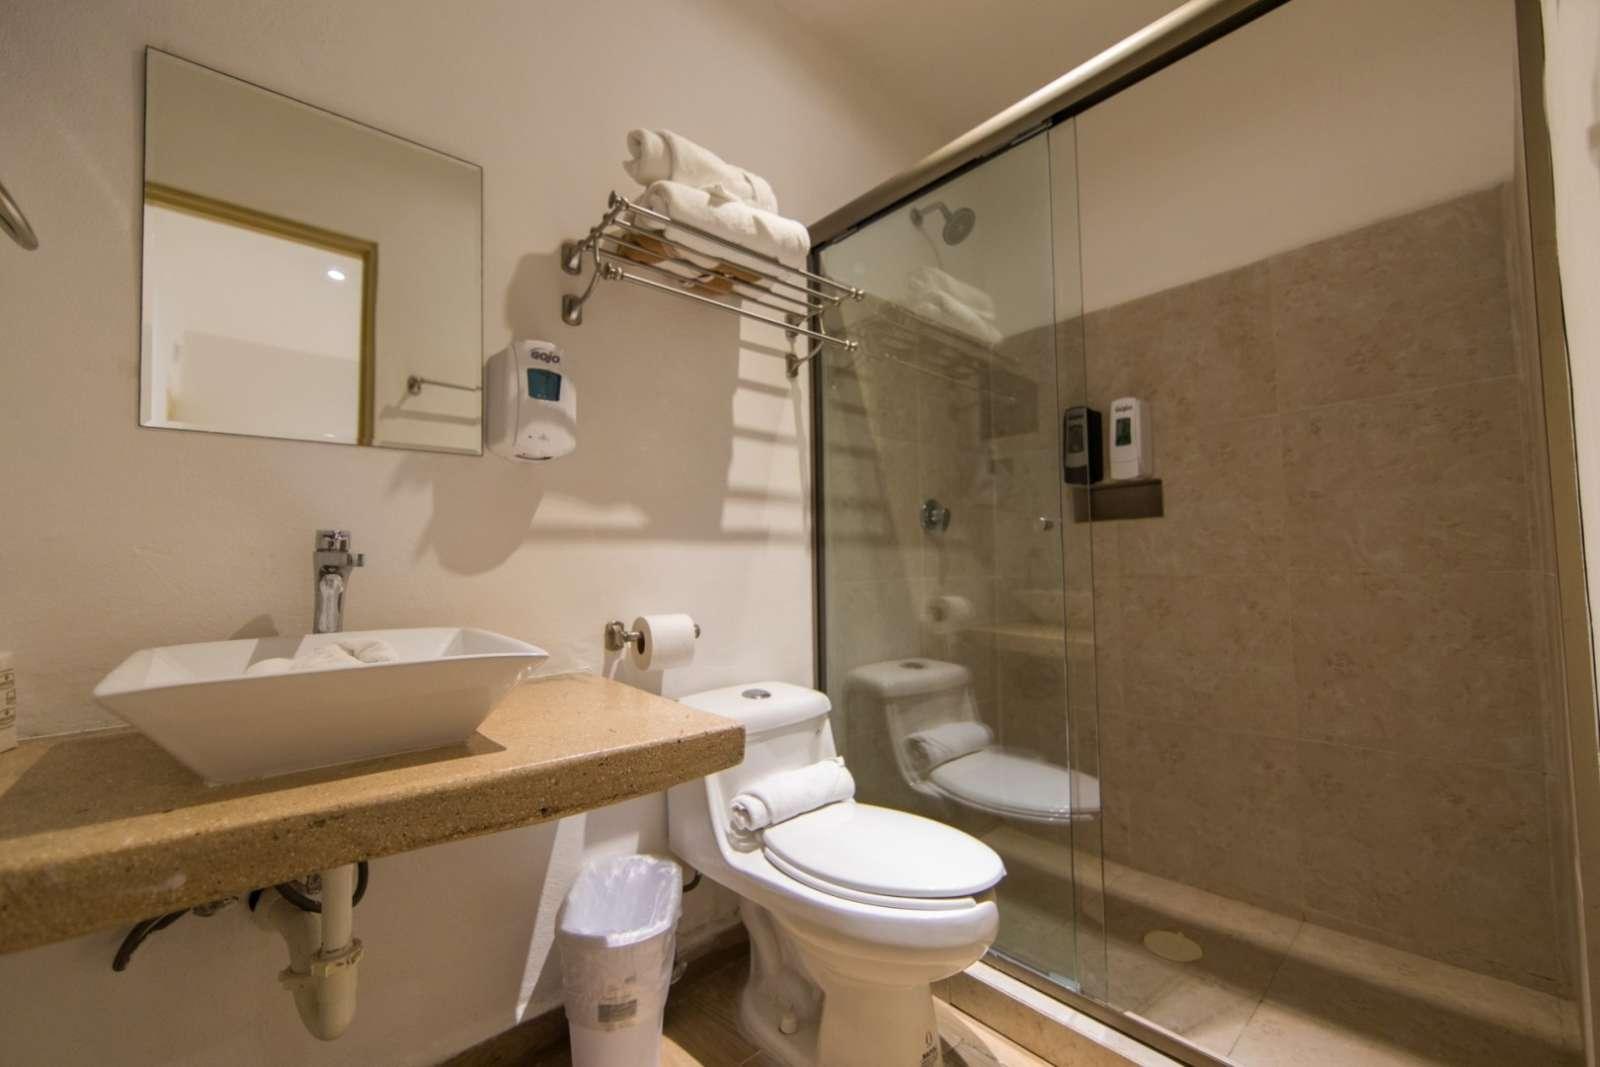 Hotel Ojo De Agua Bathroom